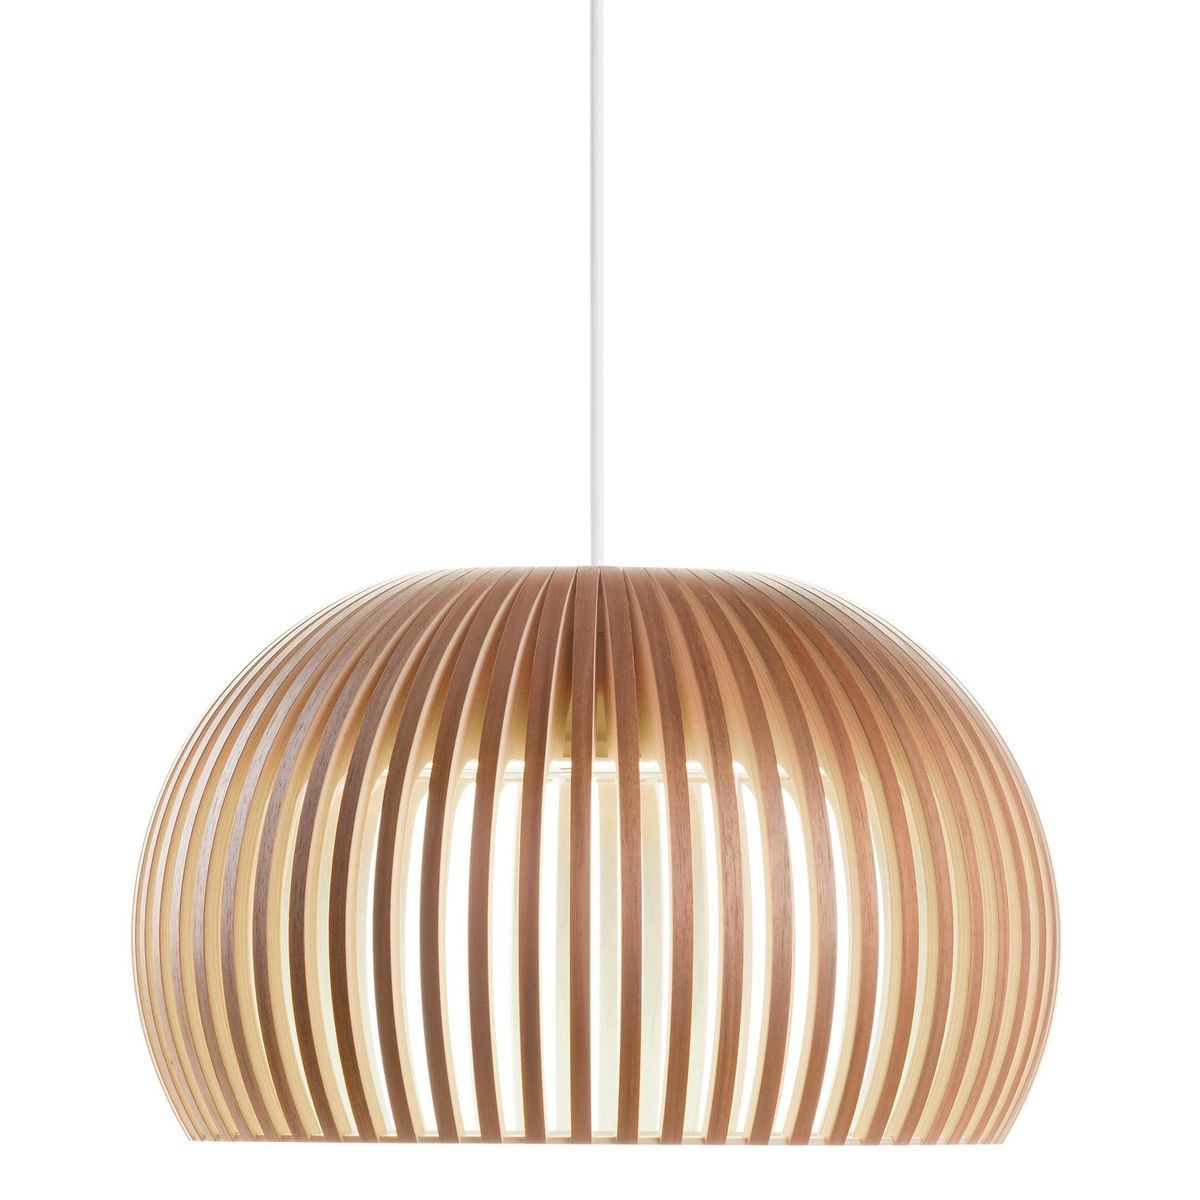 atto 5000 led suspension lamp secto design. Black Bedroom Furniture Sets. Home Design Ideas